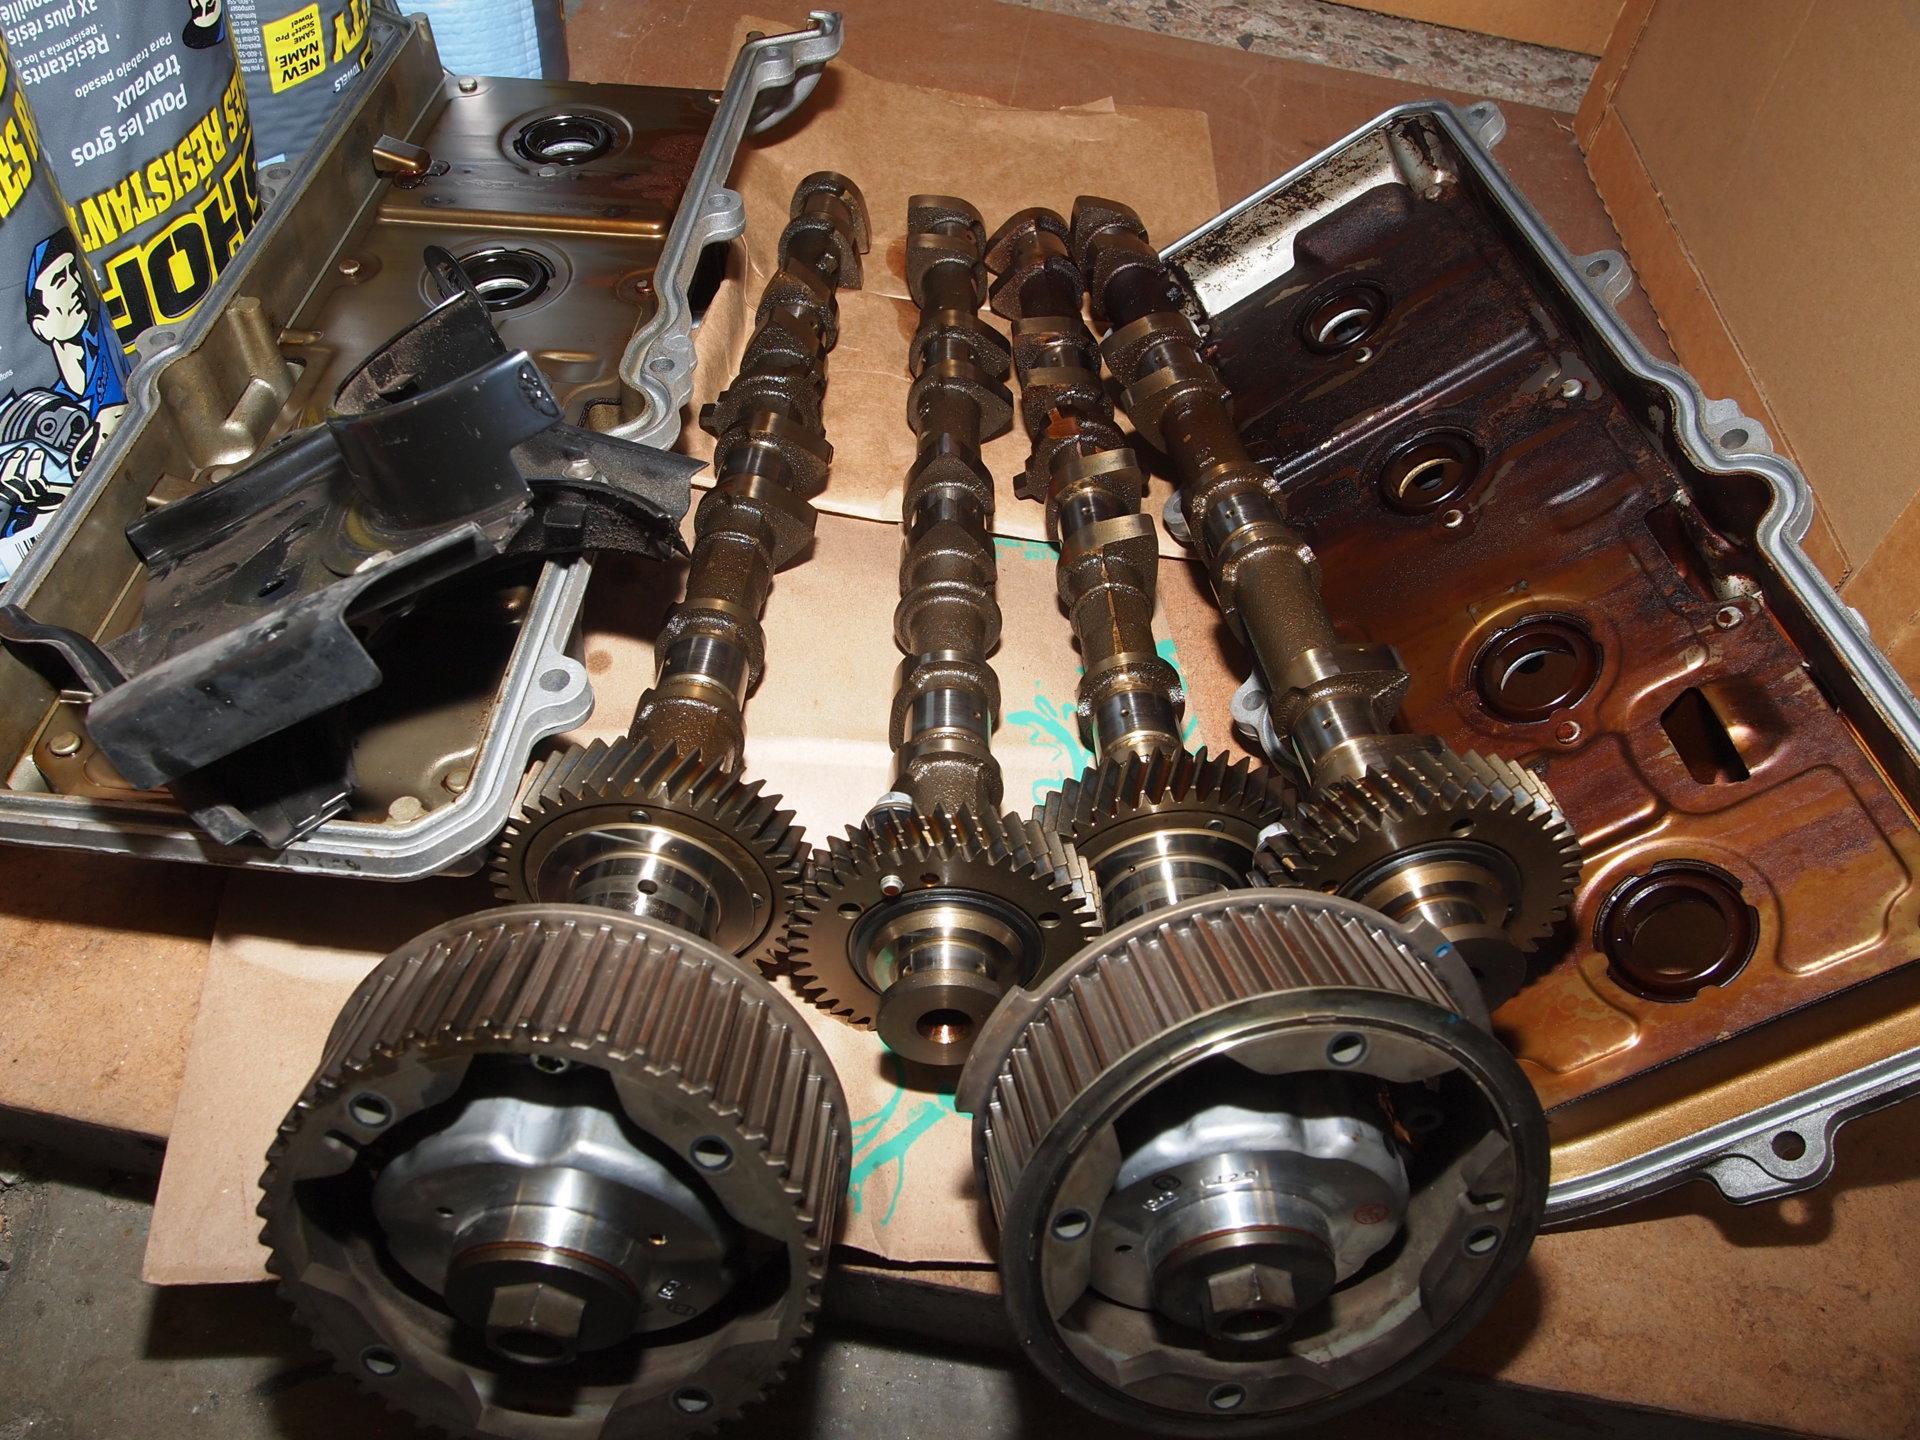 Help Identify This Engine Noise Please | IH8MUD Forum